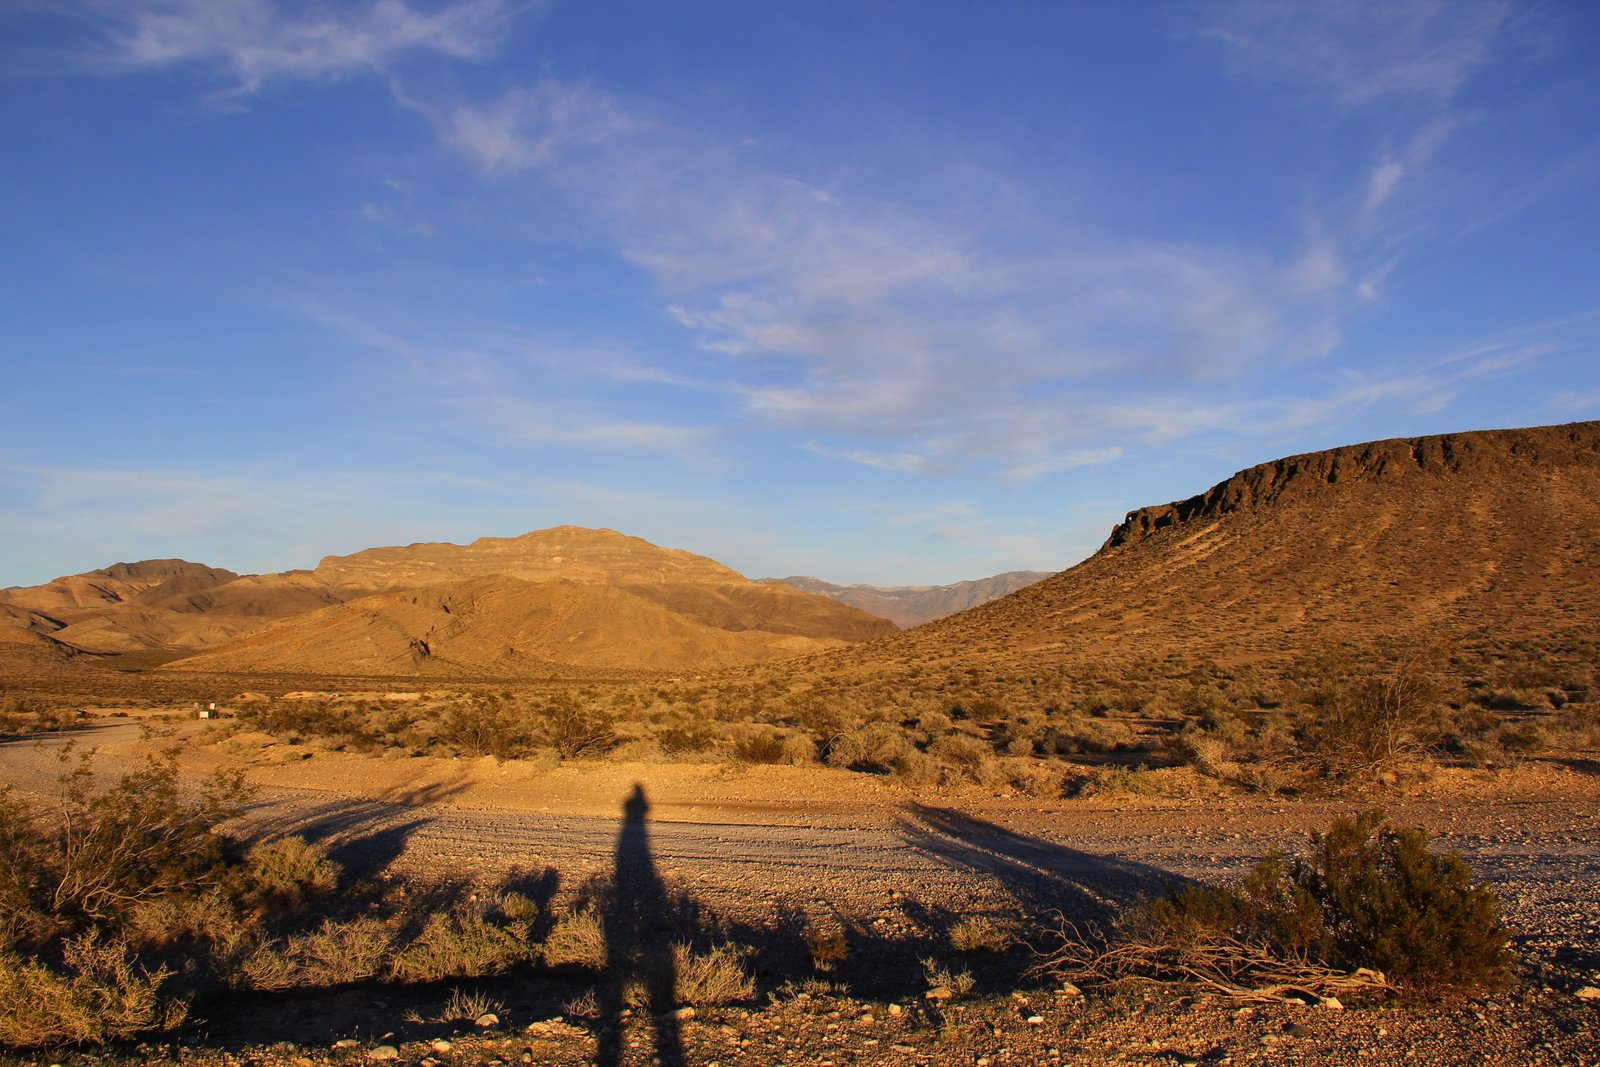 Dolina_Smierci_Death_Valley_Nevada_photo_photo_2400